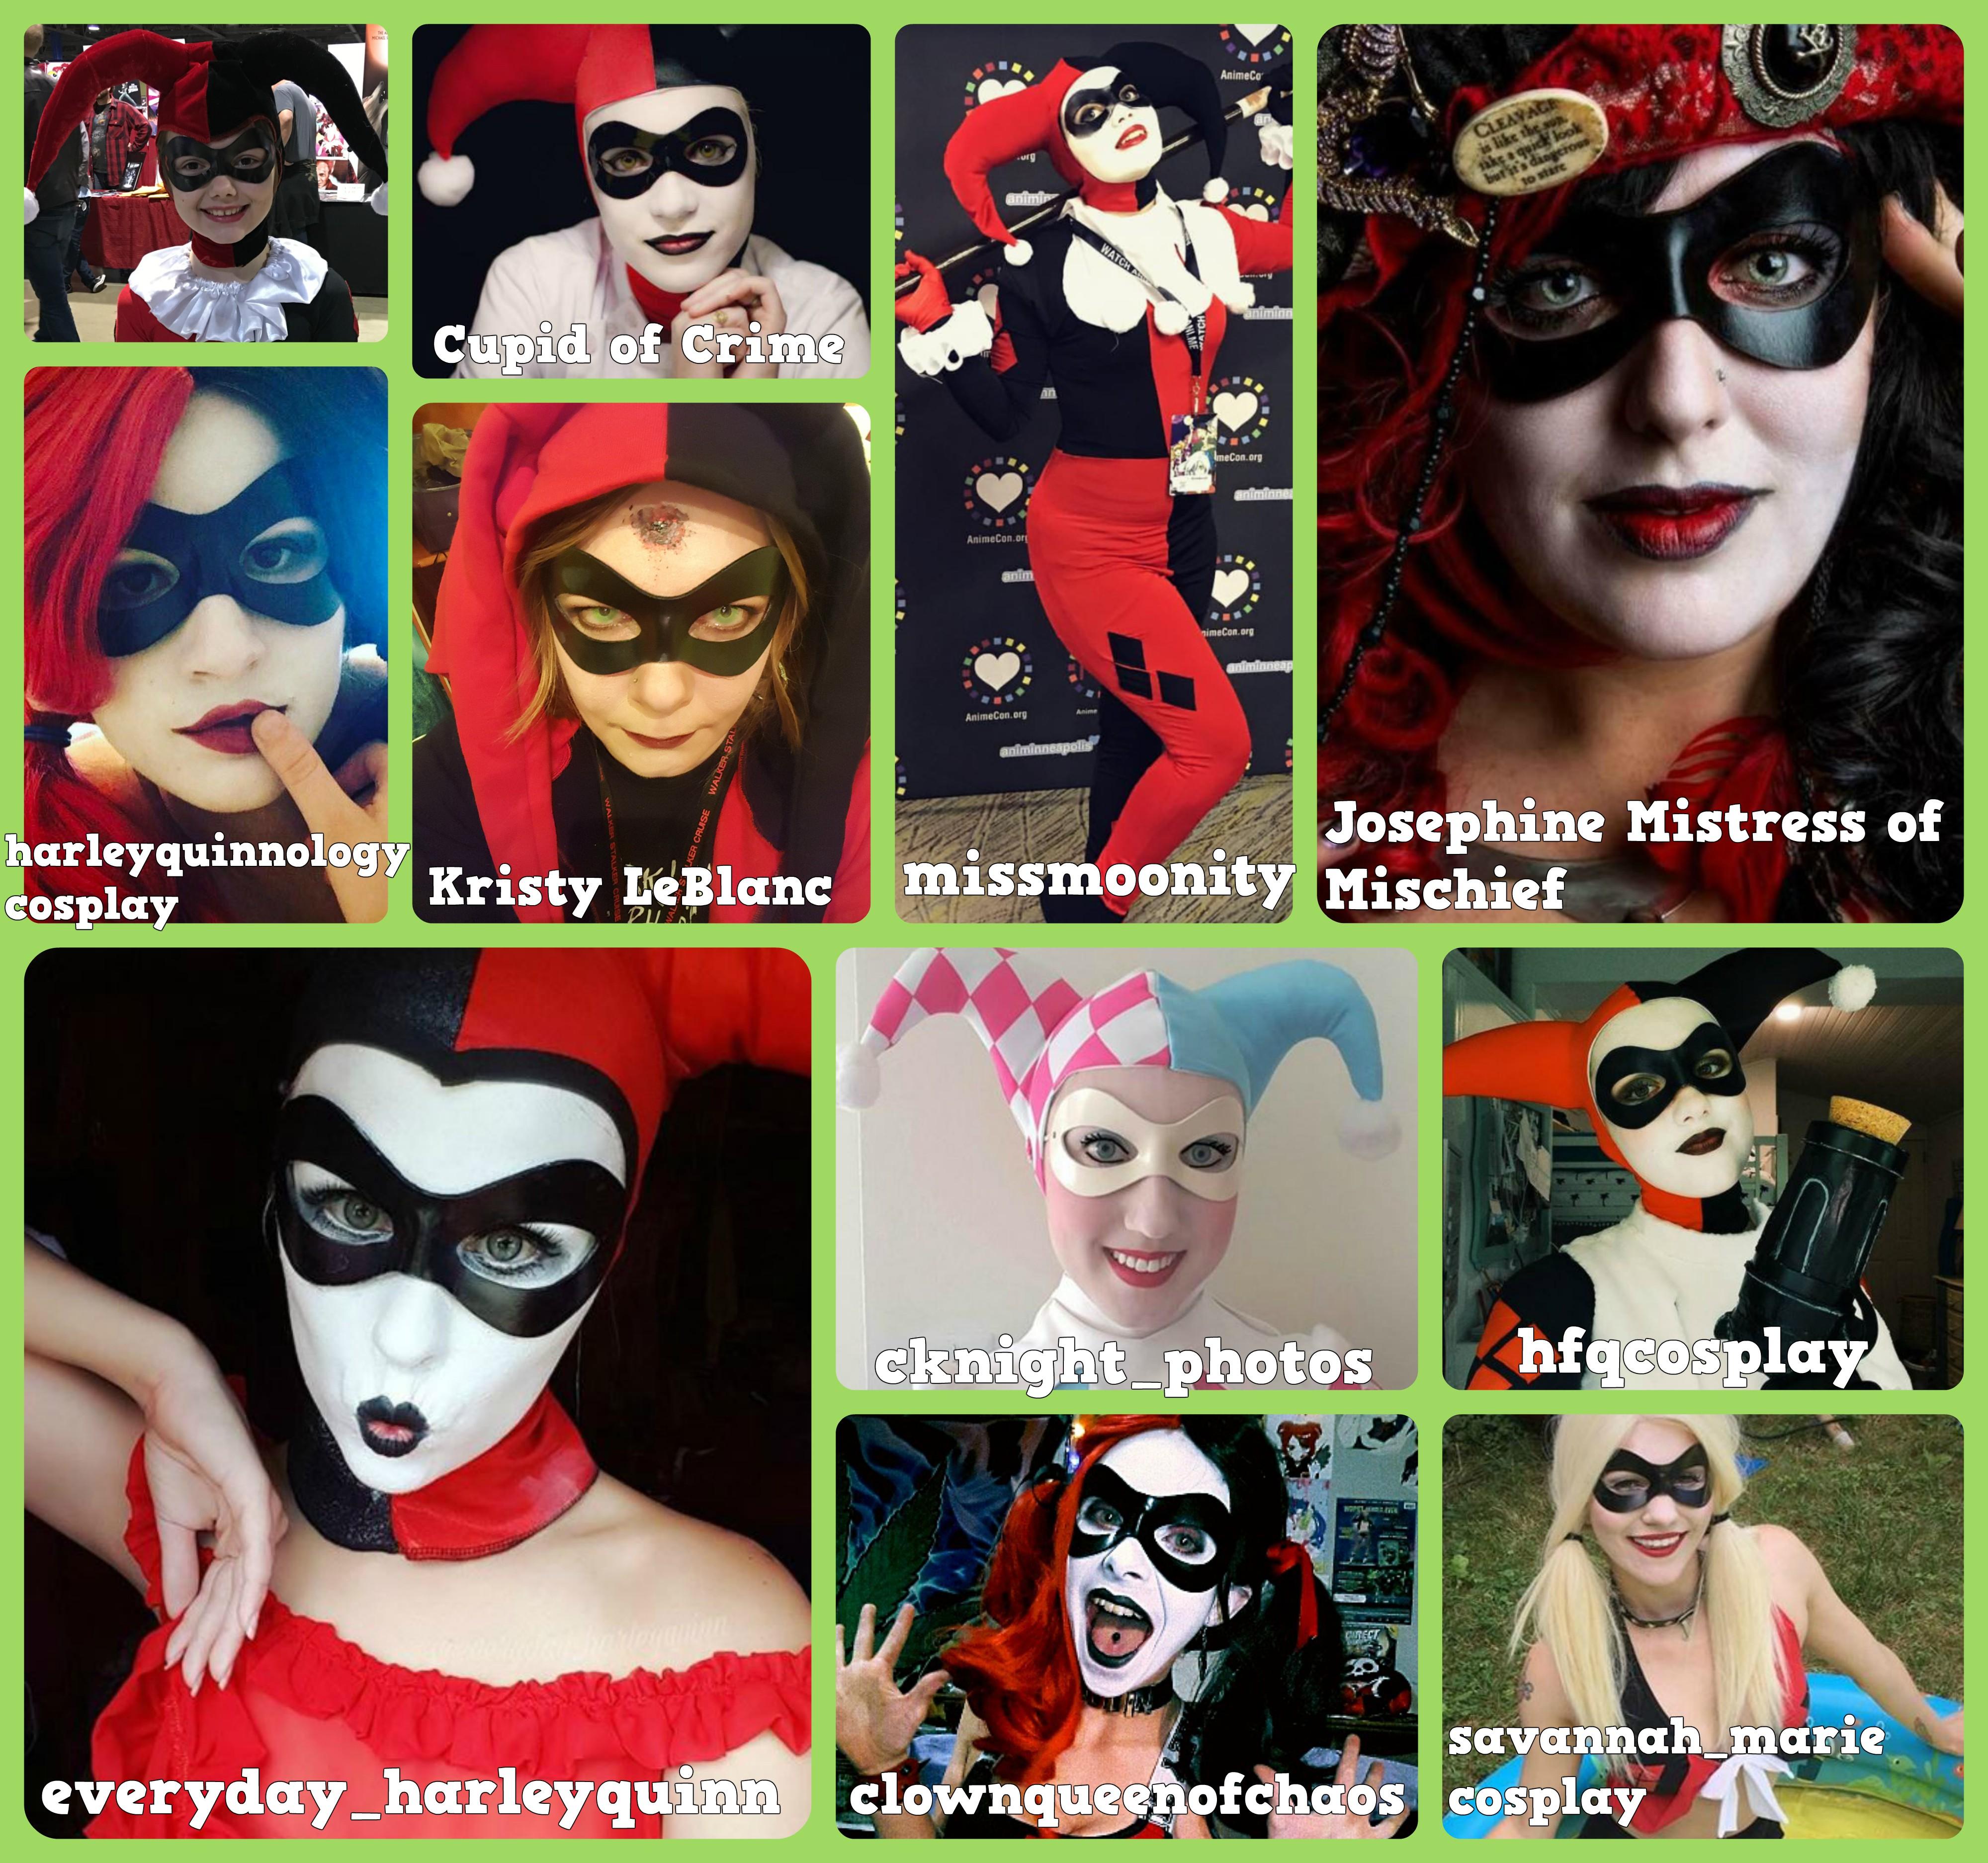 harley-quinn-mask-cosplay-collage-3.jpg